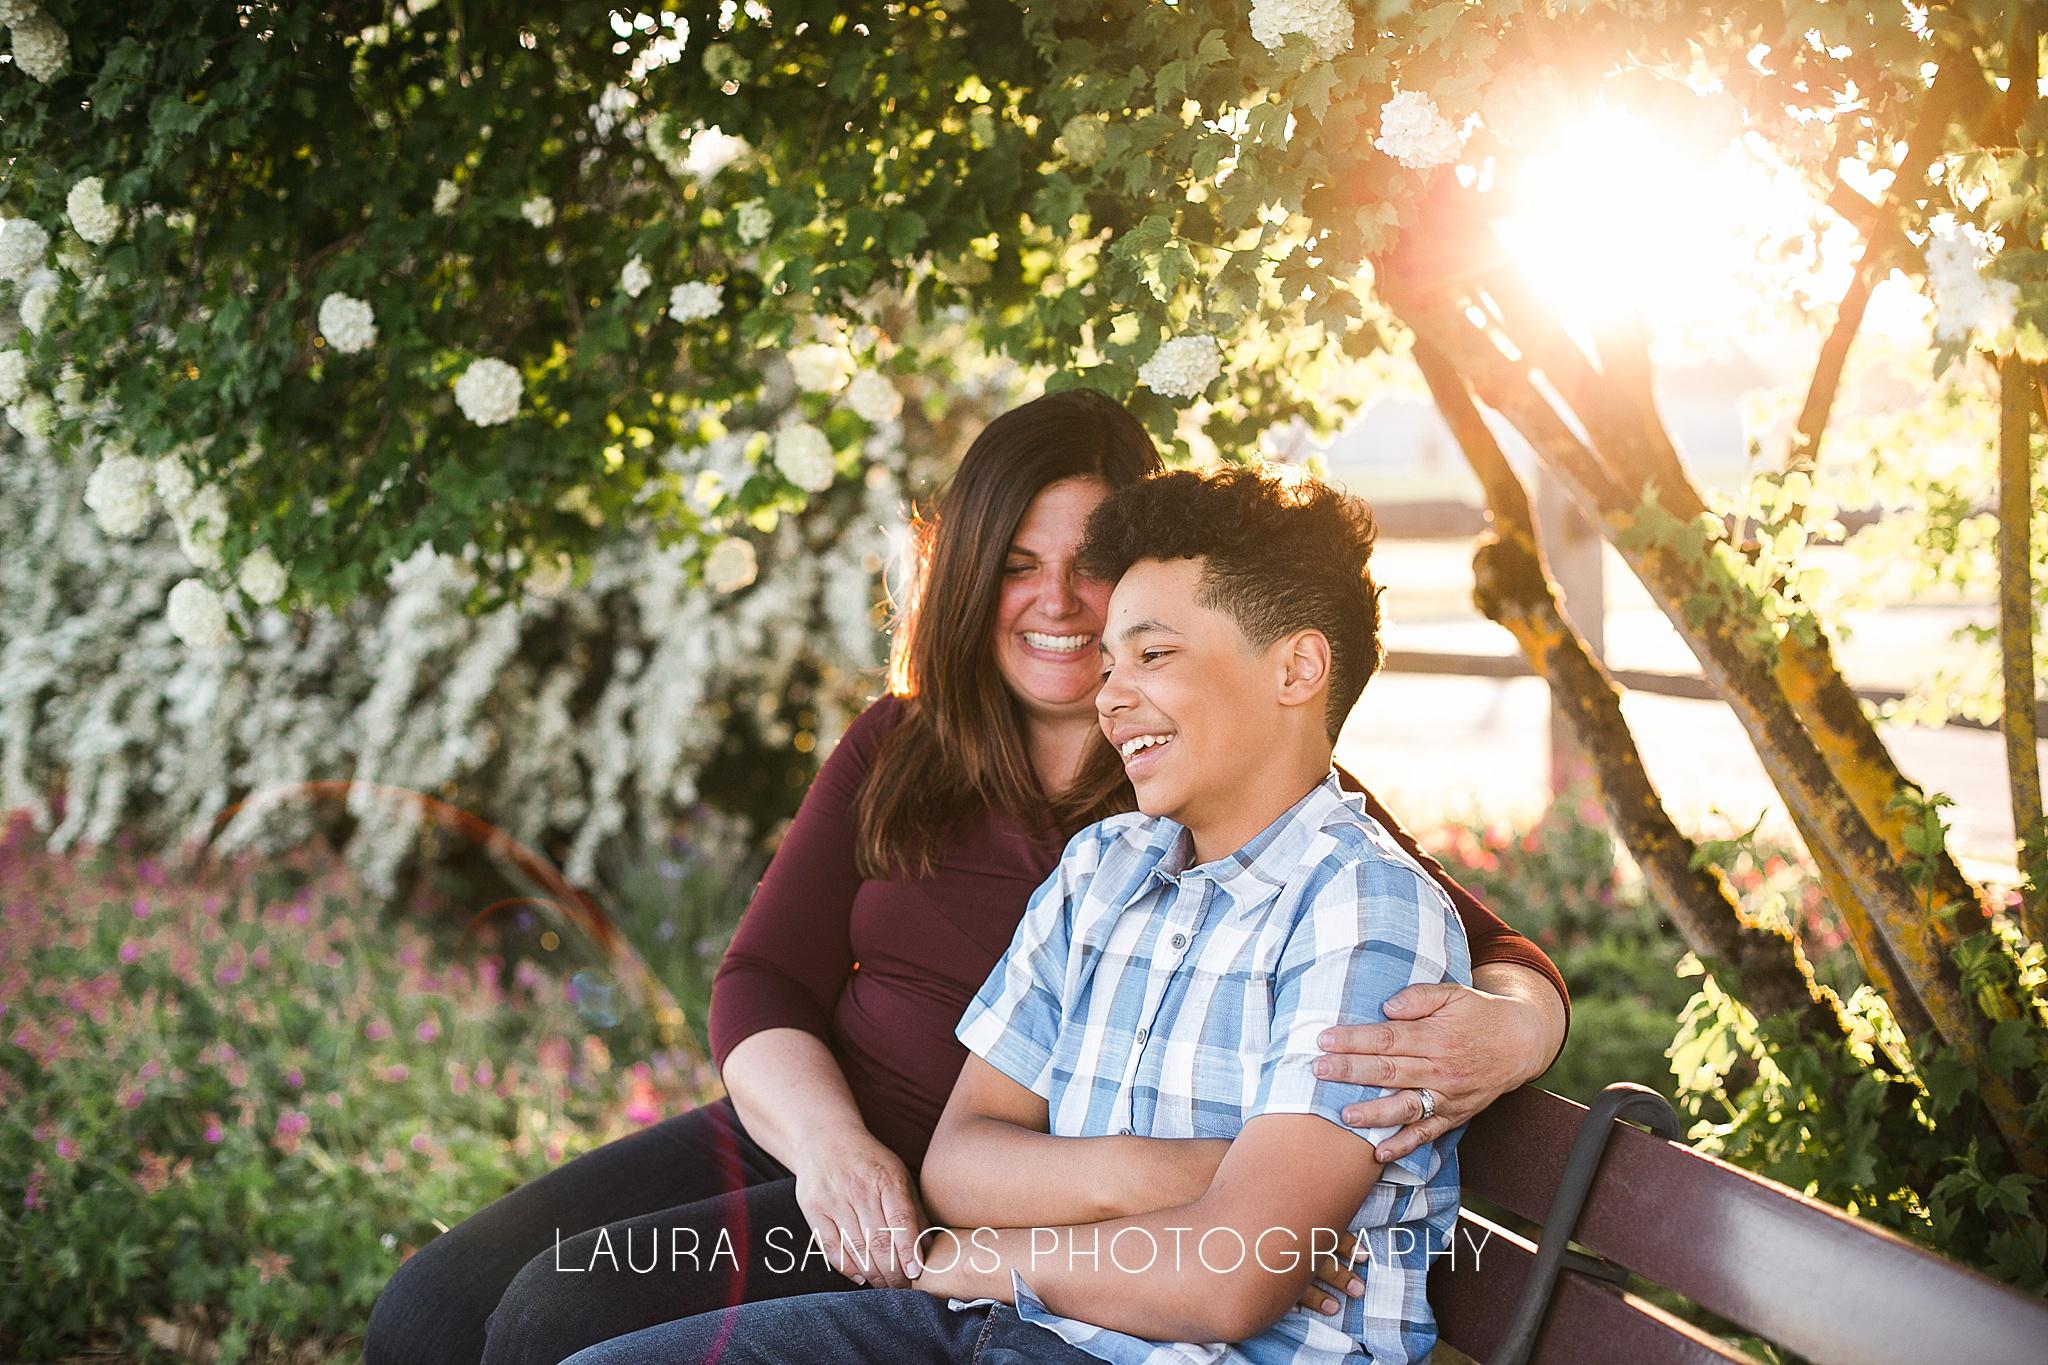 Laura Santos Photography Portland Oregon Family Photographer_0929.jpg